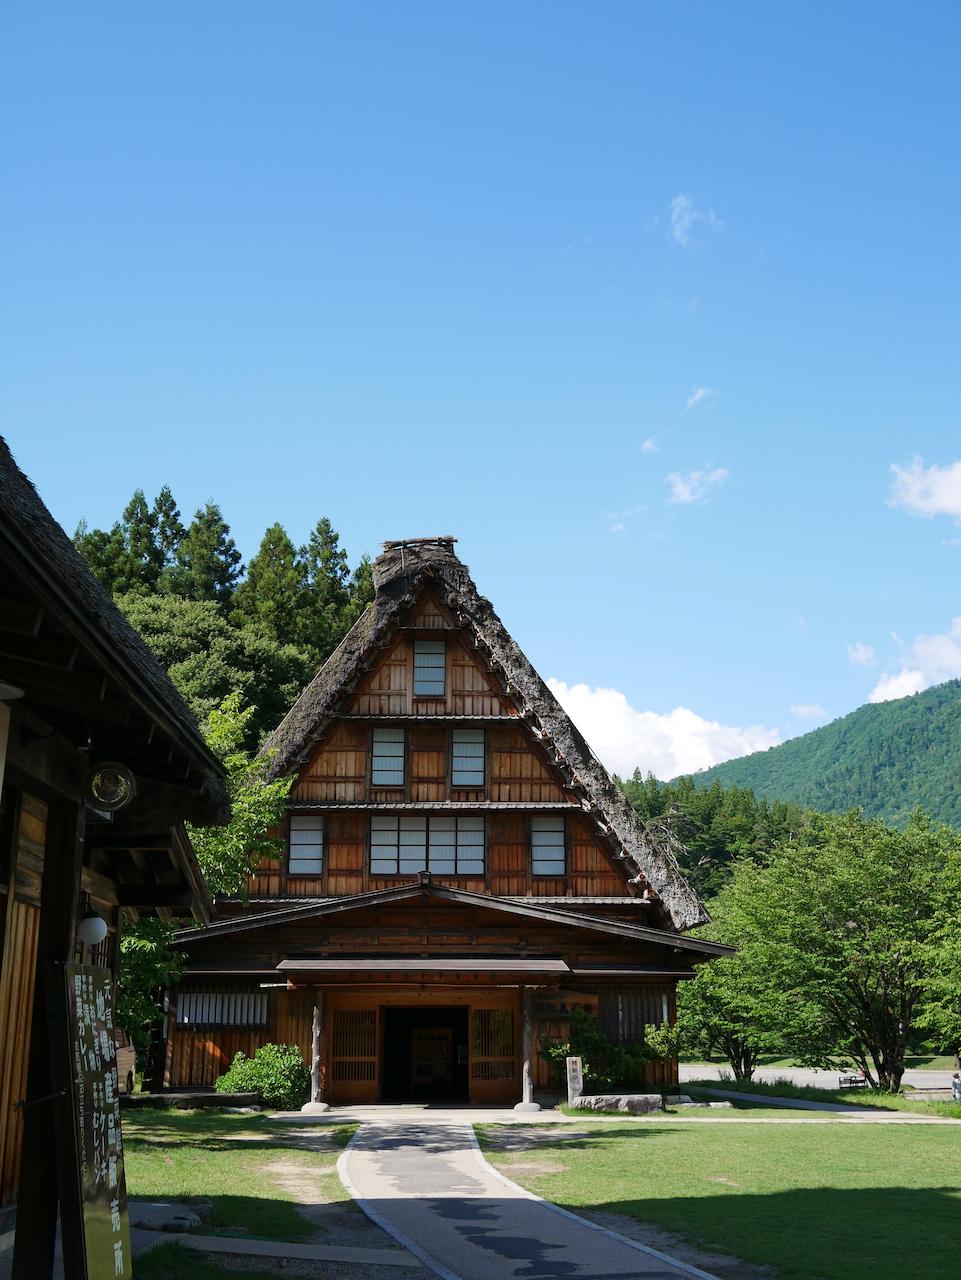 Village historique de Shirakawa-gō